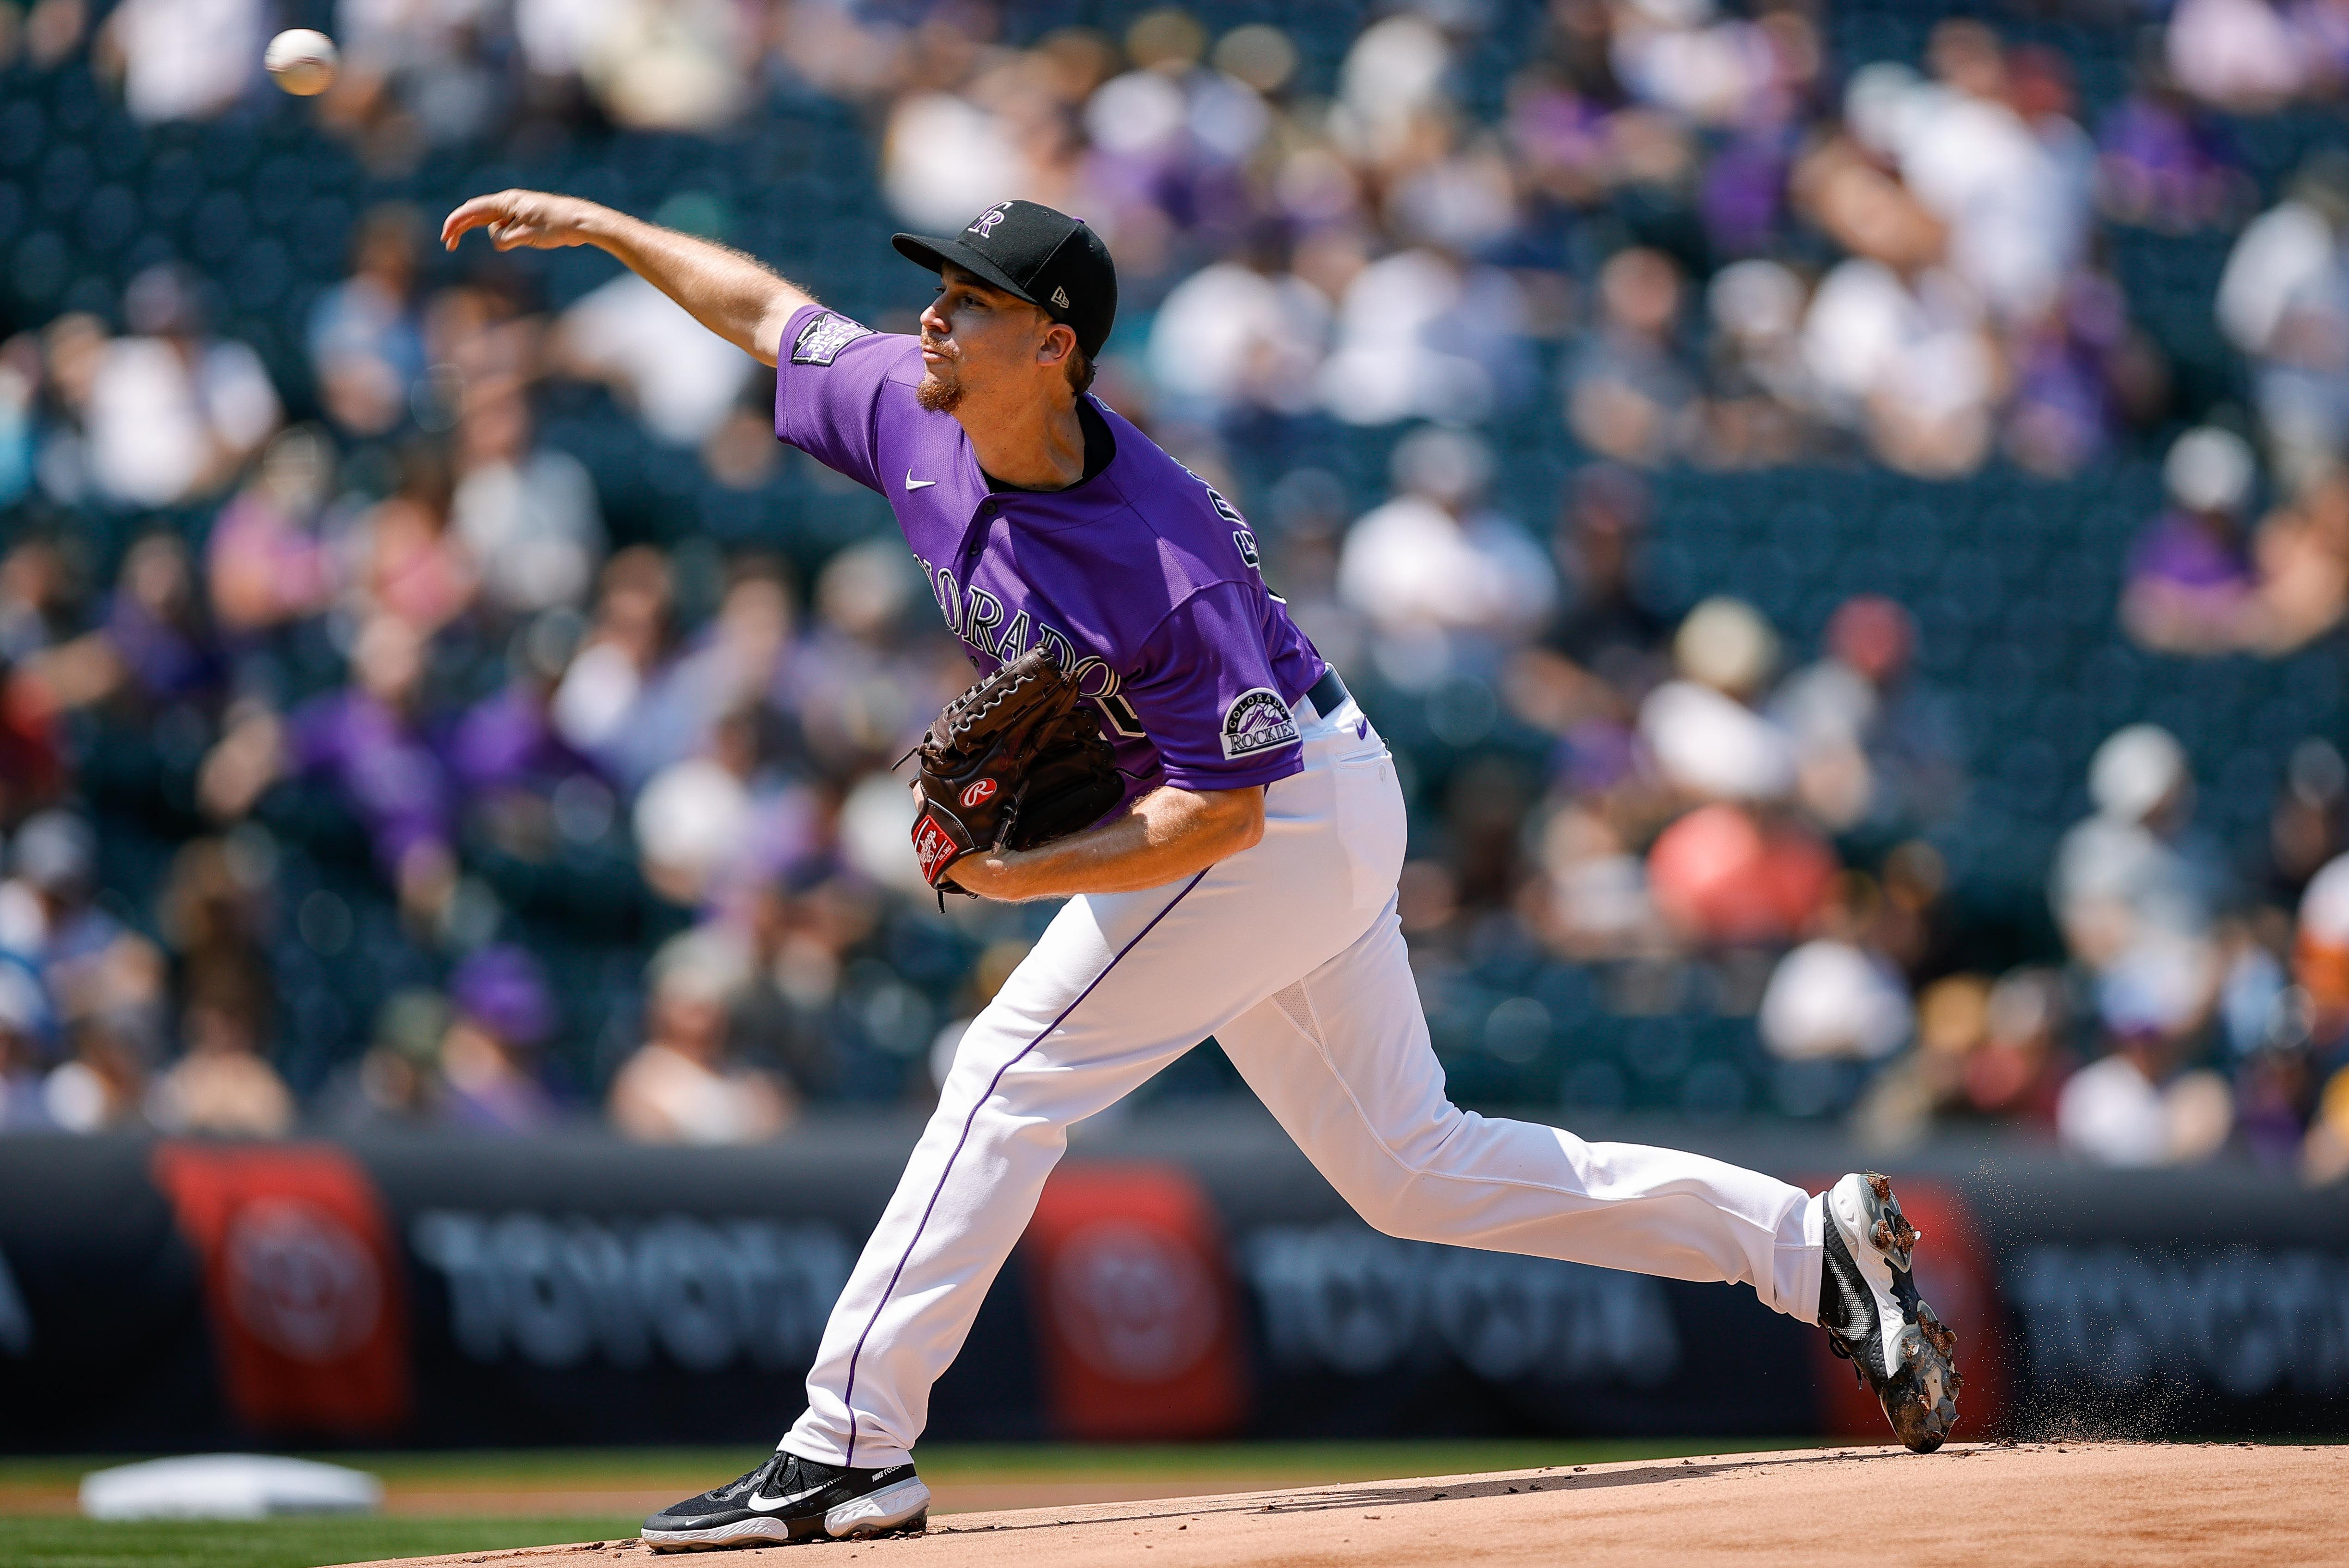 MLB: San Diego Padres at Colorado Rockies